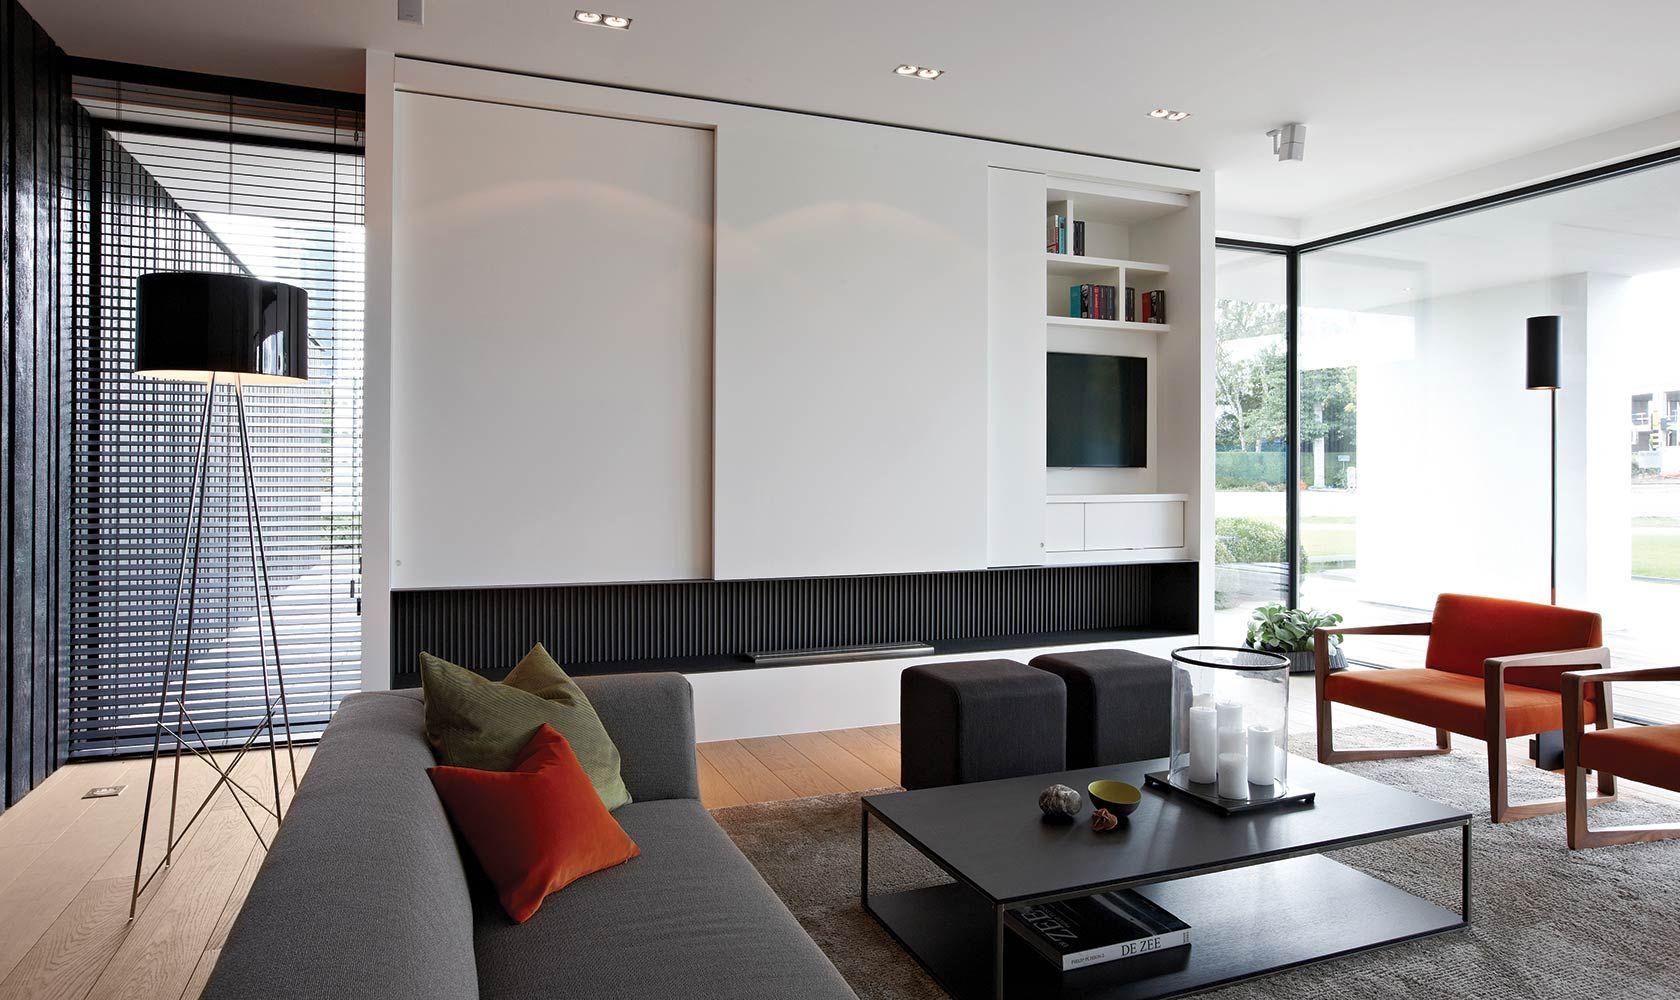 moderne gezellige woonkamer - Google zoeken | Woonkamer ...